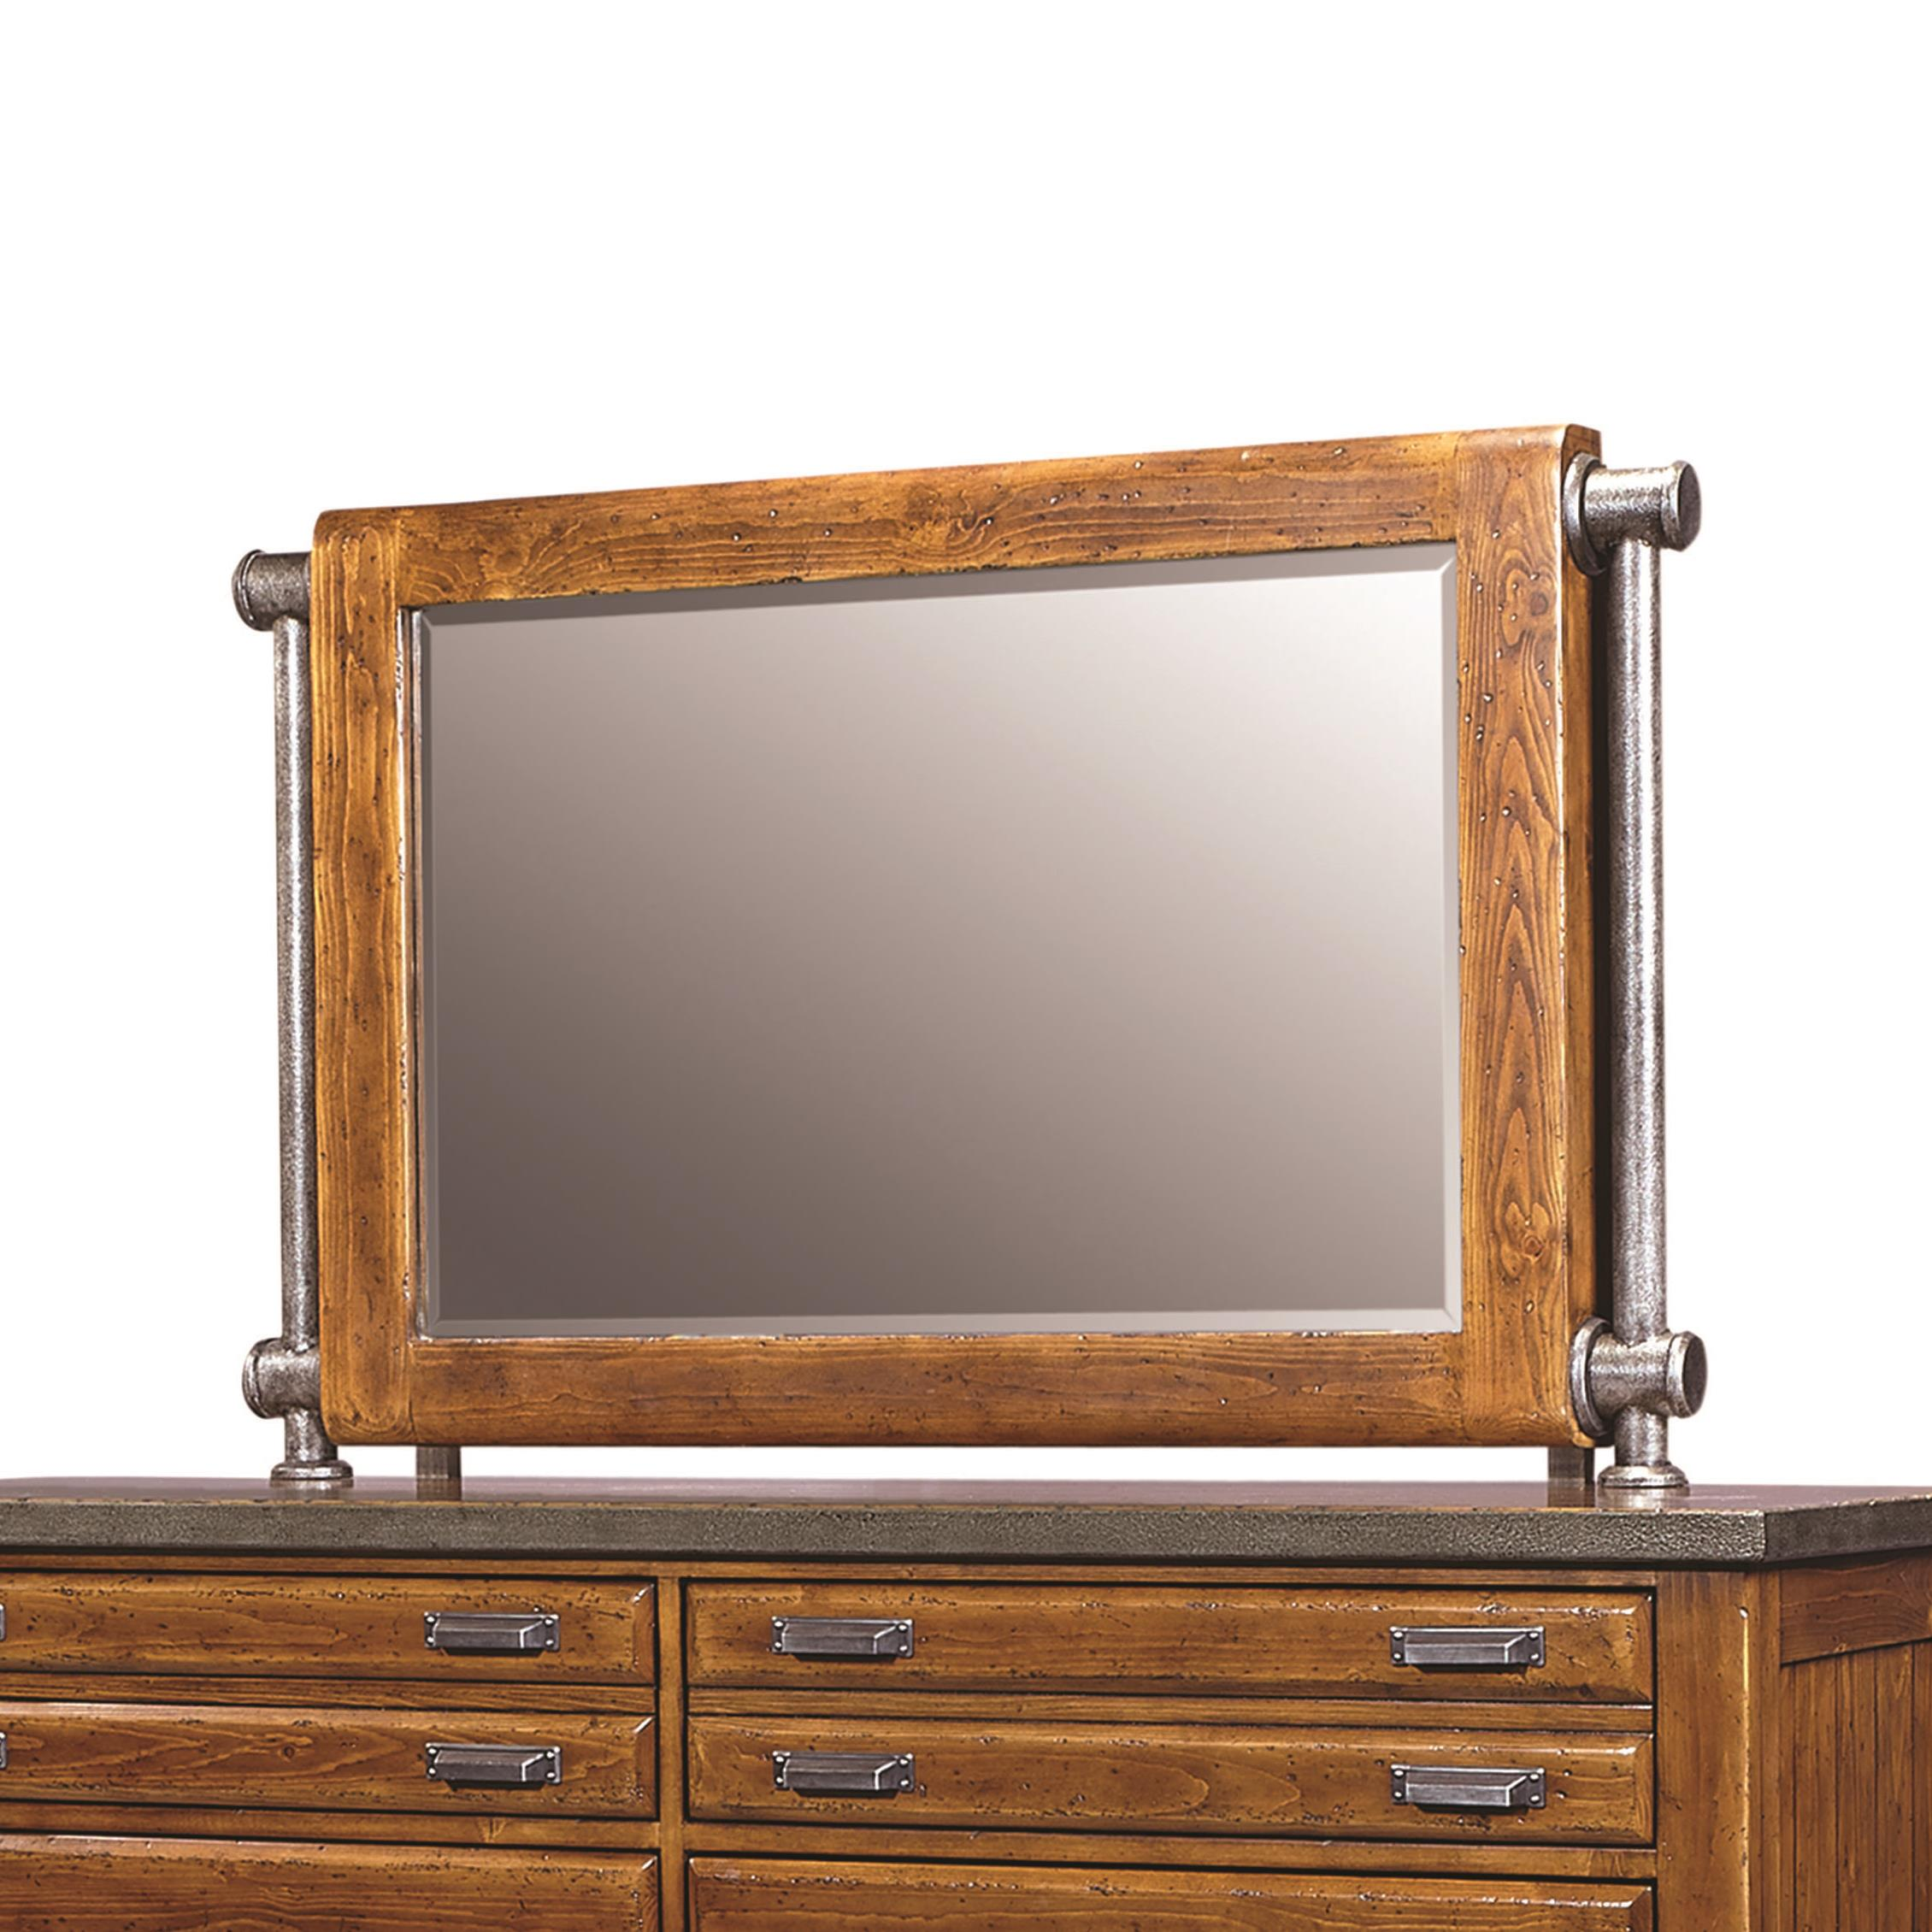 Aspenhome Rockland Chesser Mirror - Item Number: I58-466